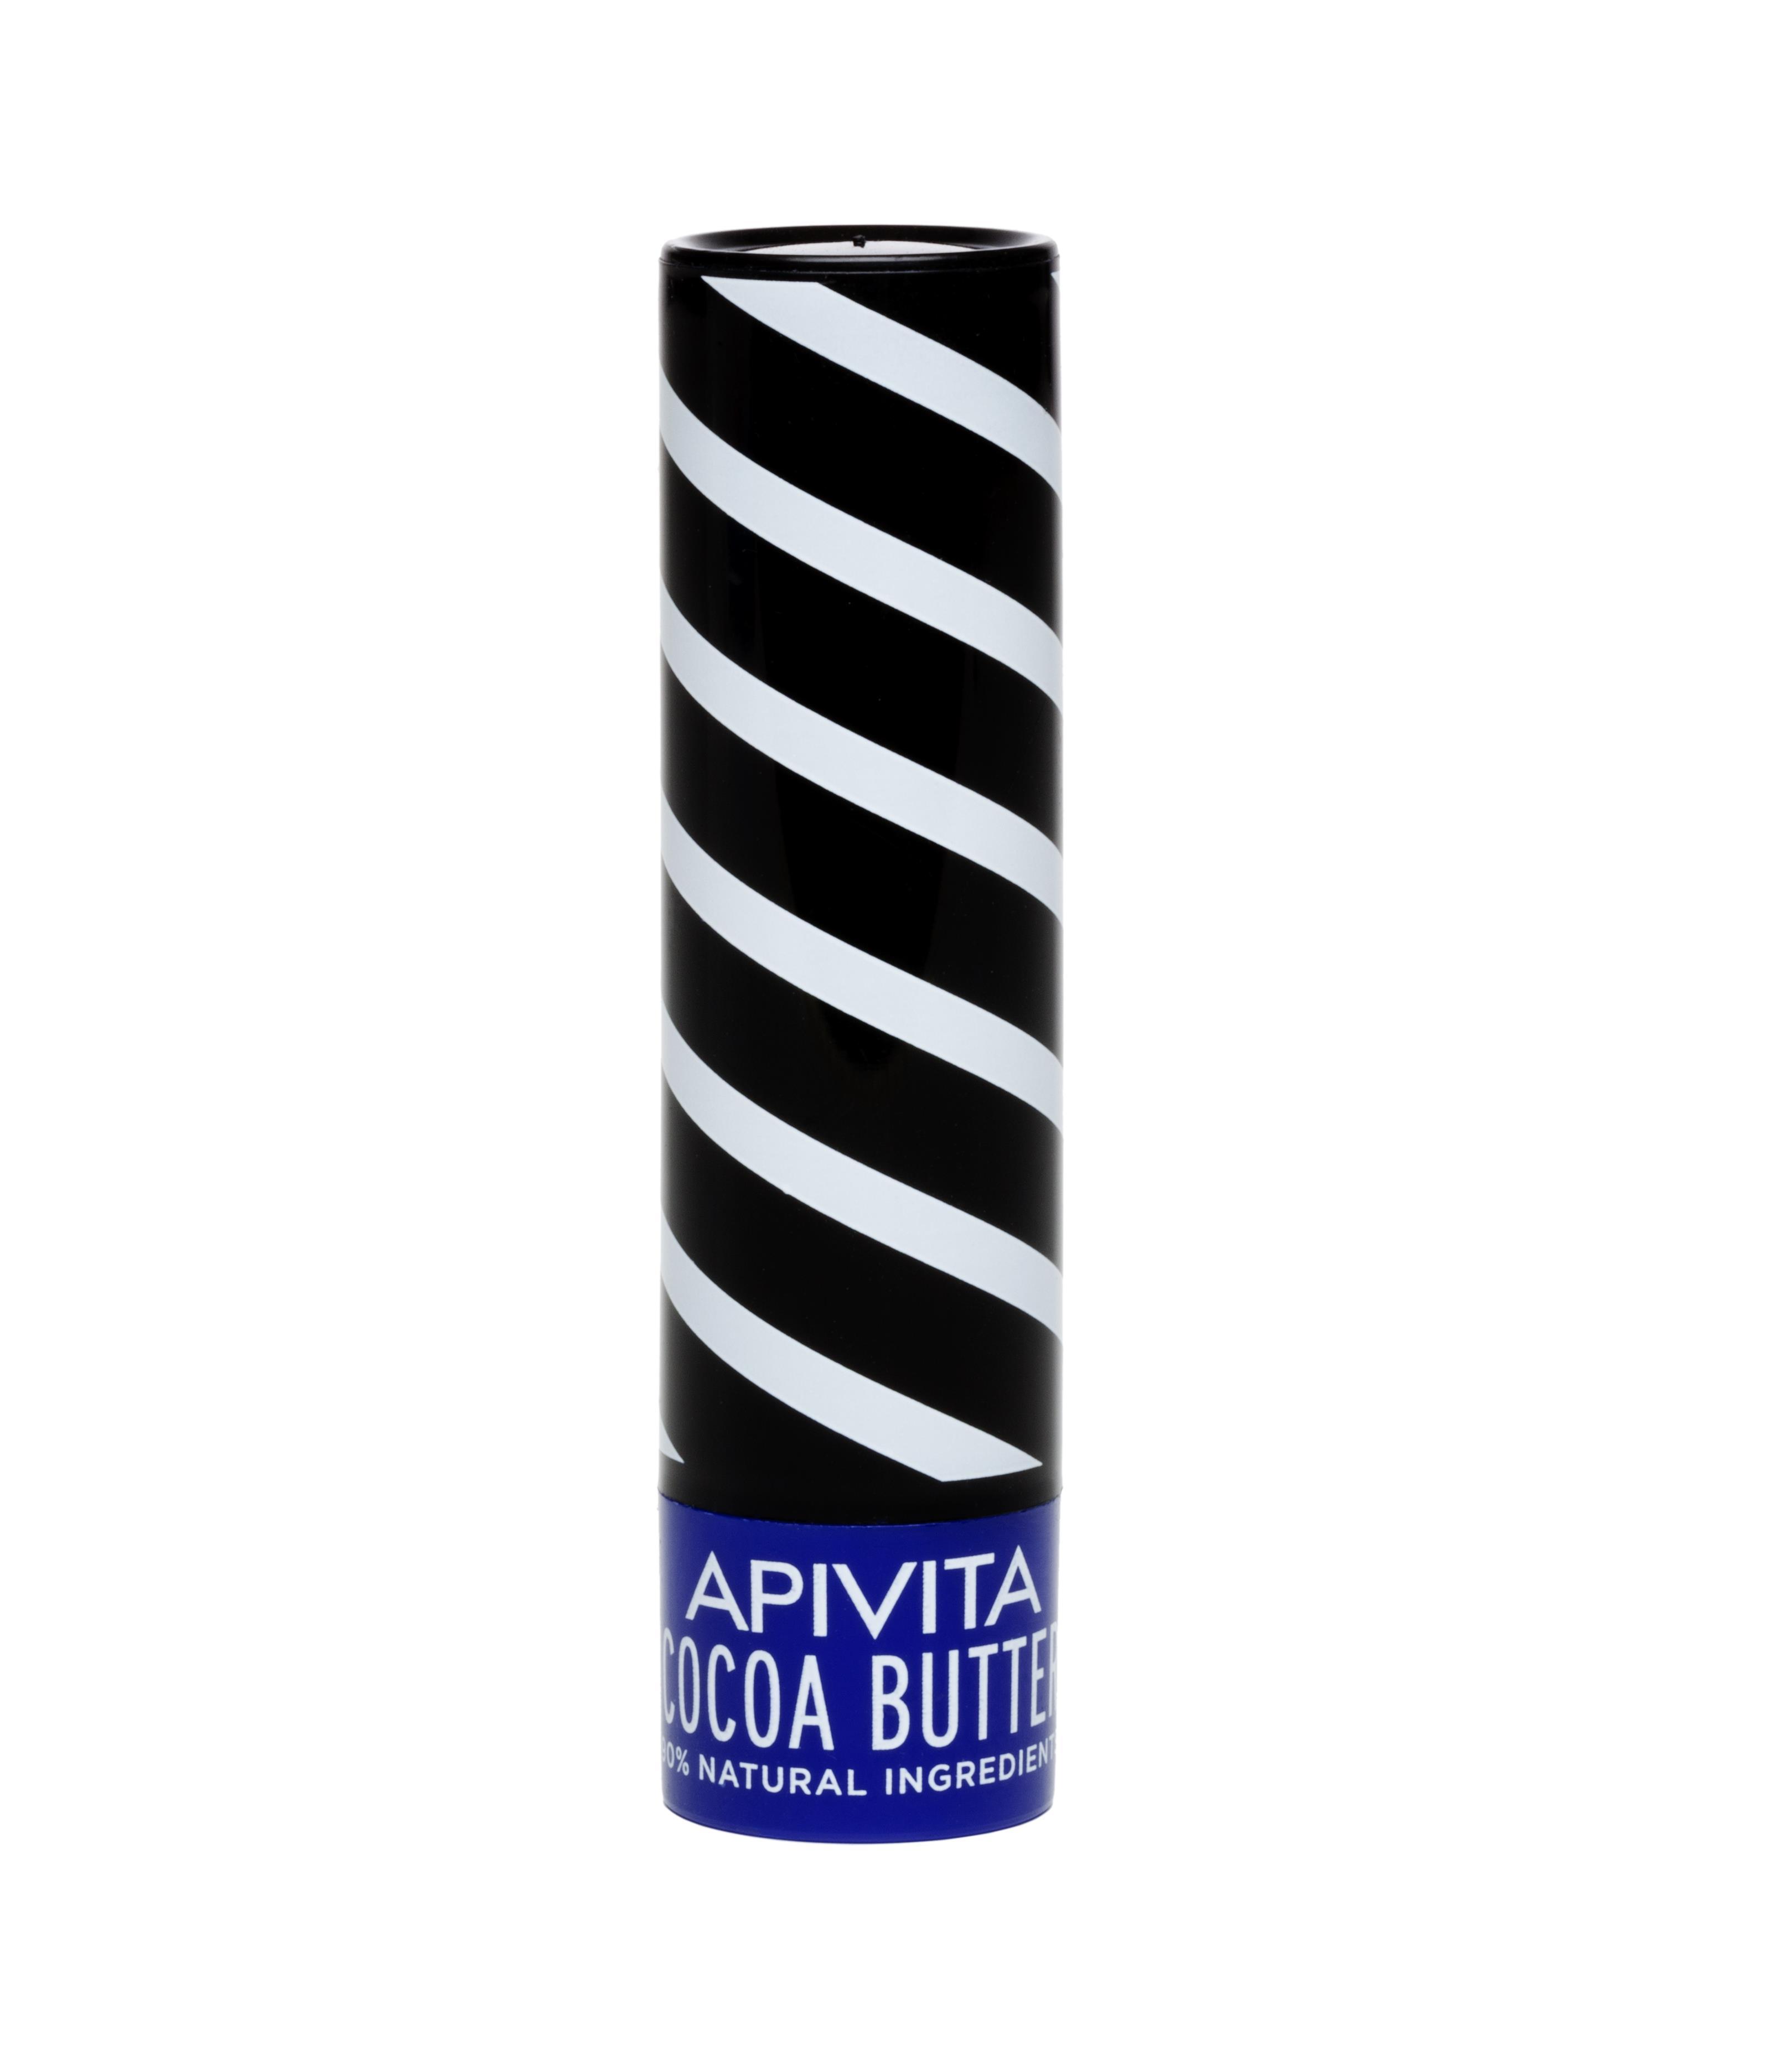 APIVITA Ajakápoló stift kakaóvajjal, SPF20 4,4g